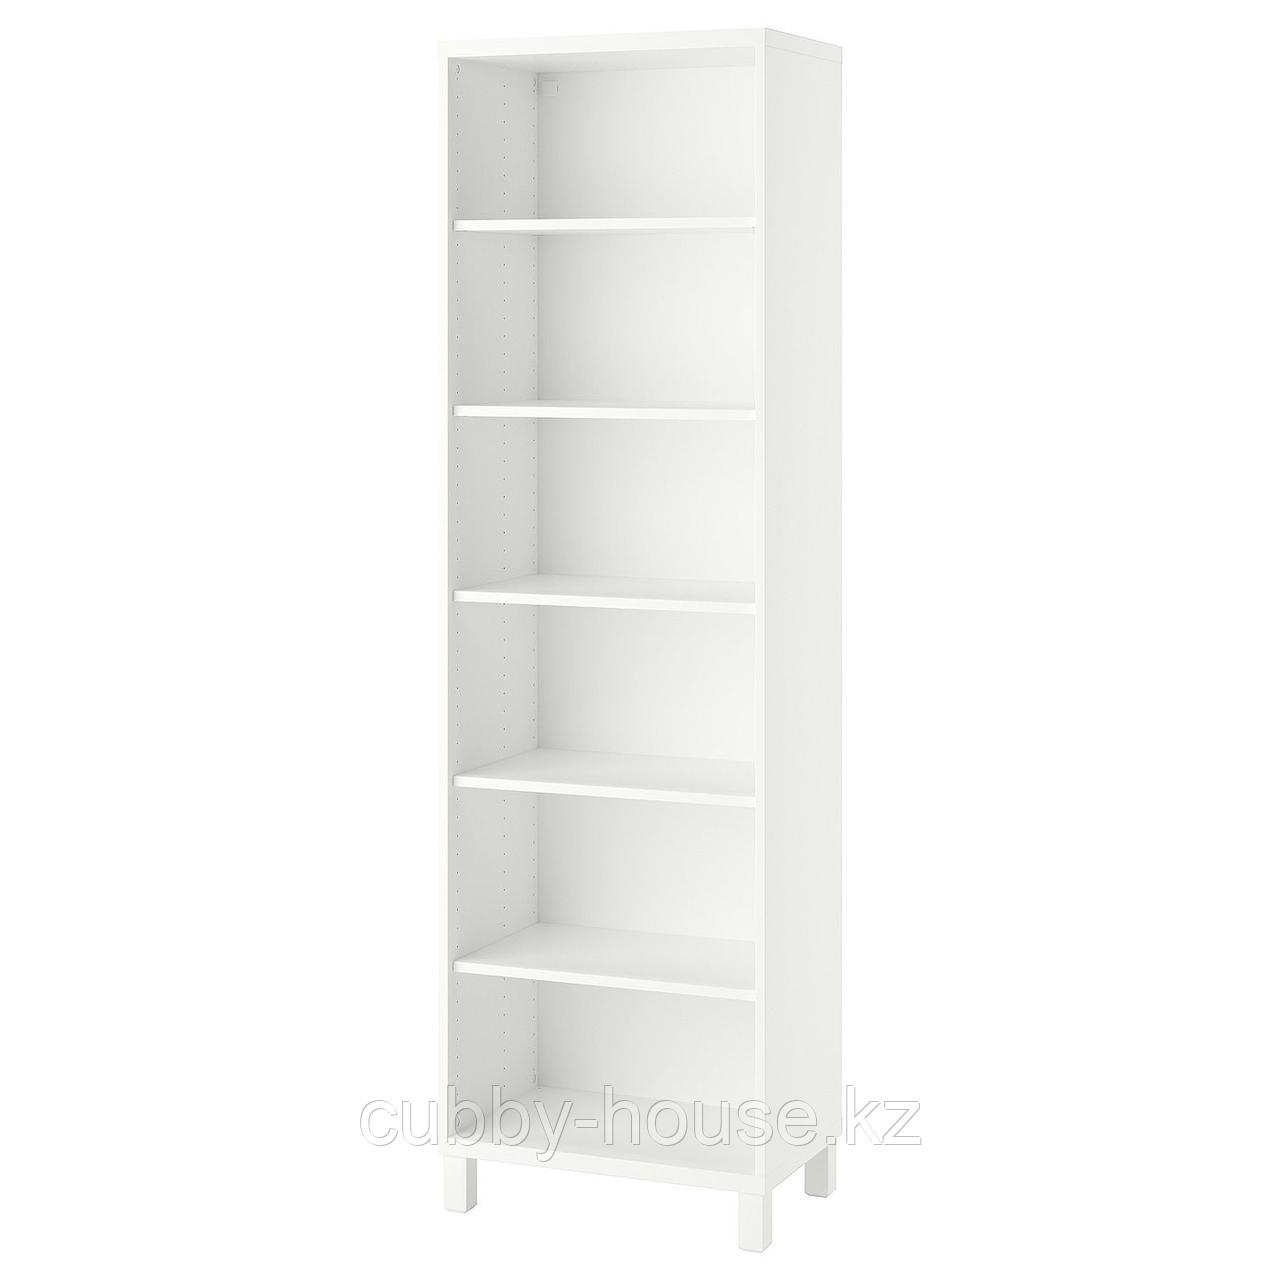 БЕСТО Шкаф, белый, 60x40x202 см